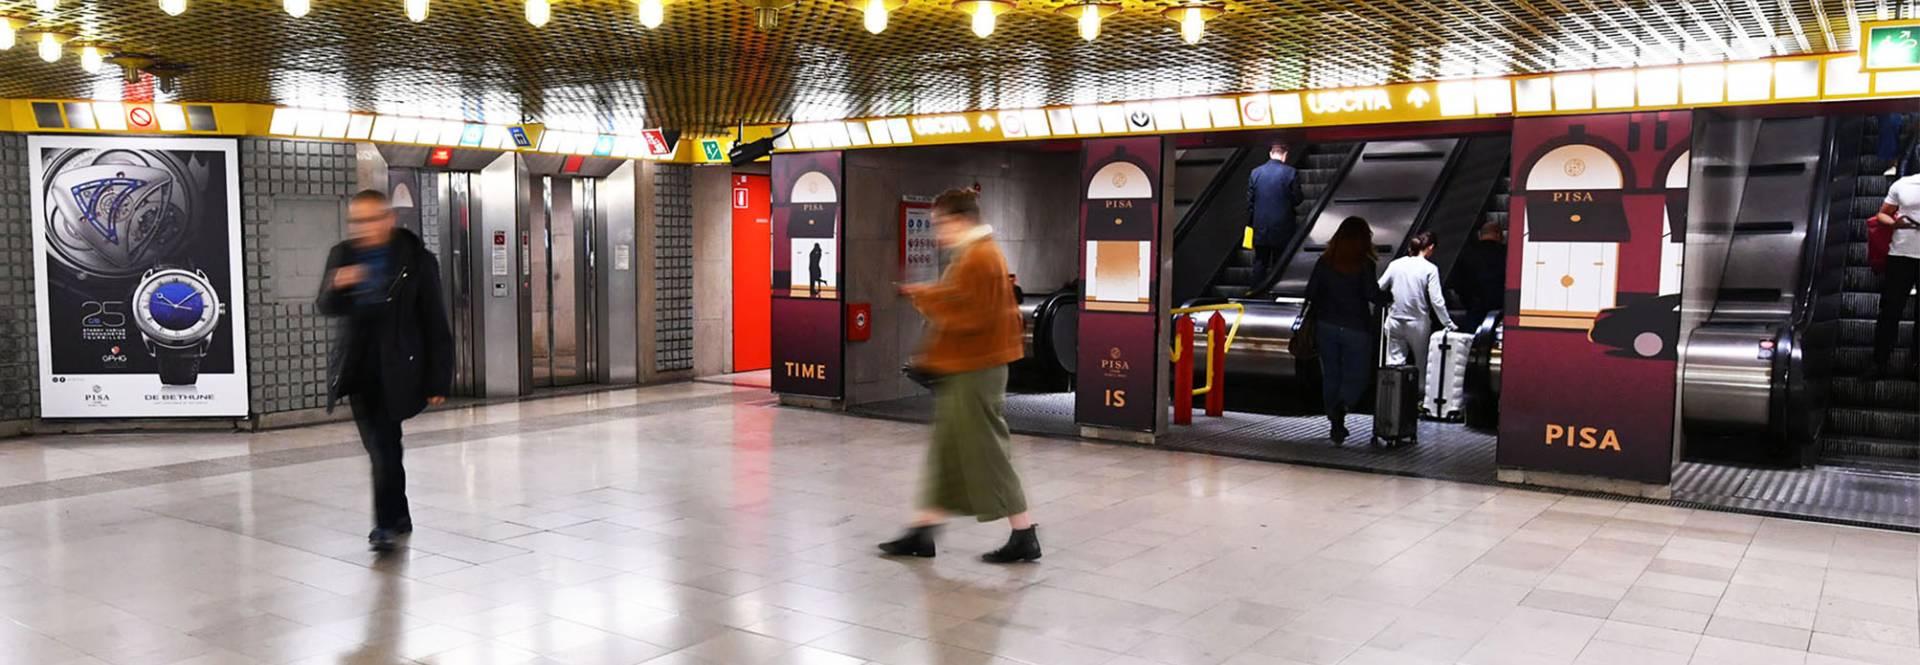 IGPDecaux_Station_Domination_Pisa_Orologeria